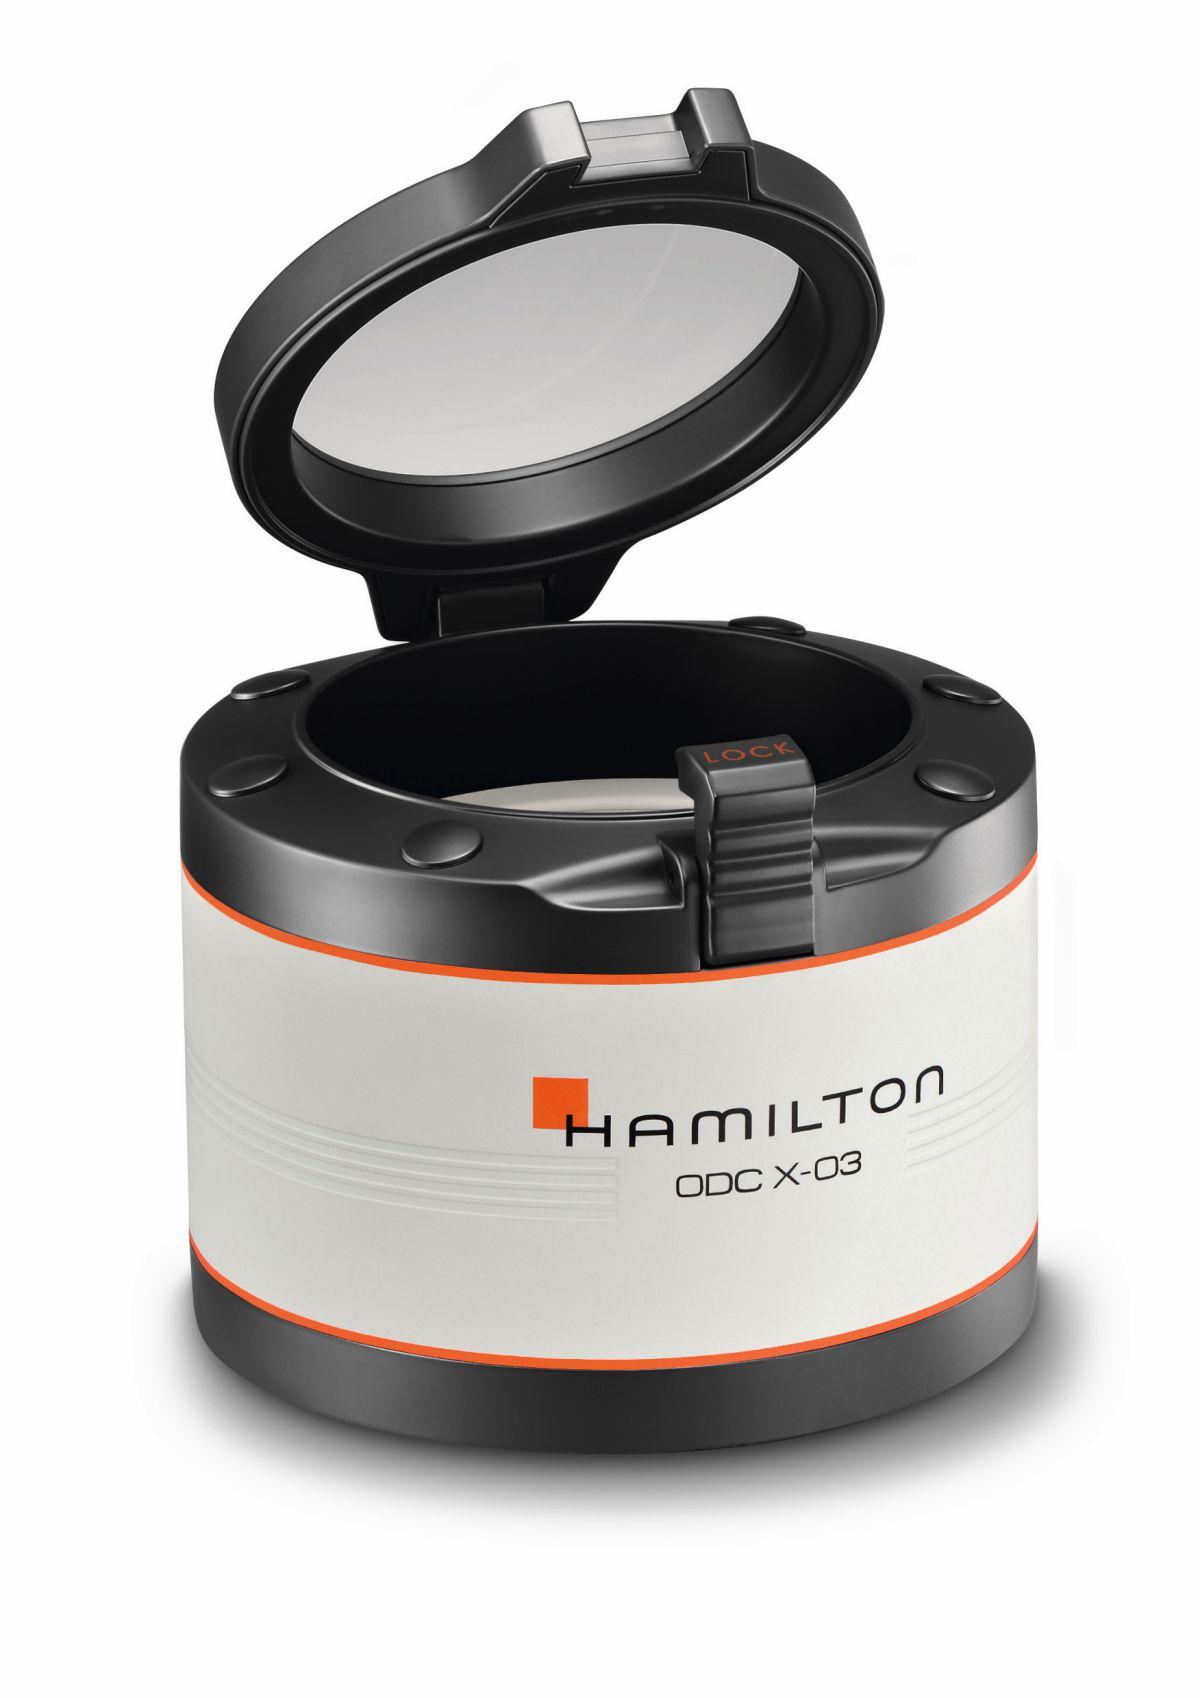 Hamilton-ODC-X-03-H51598990-7.jpg